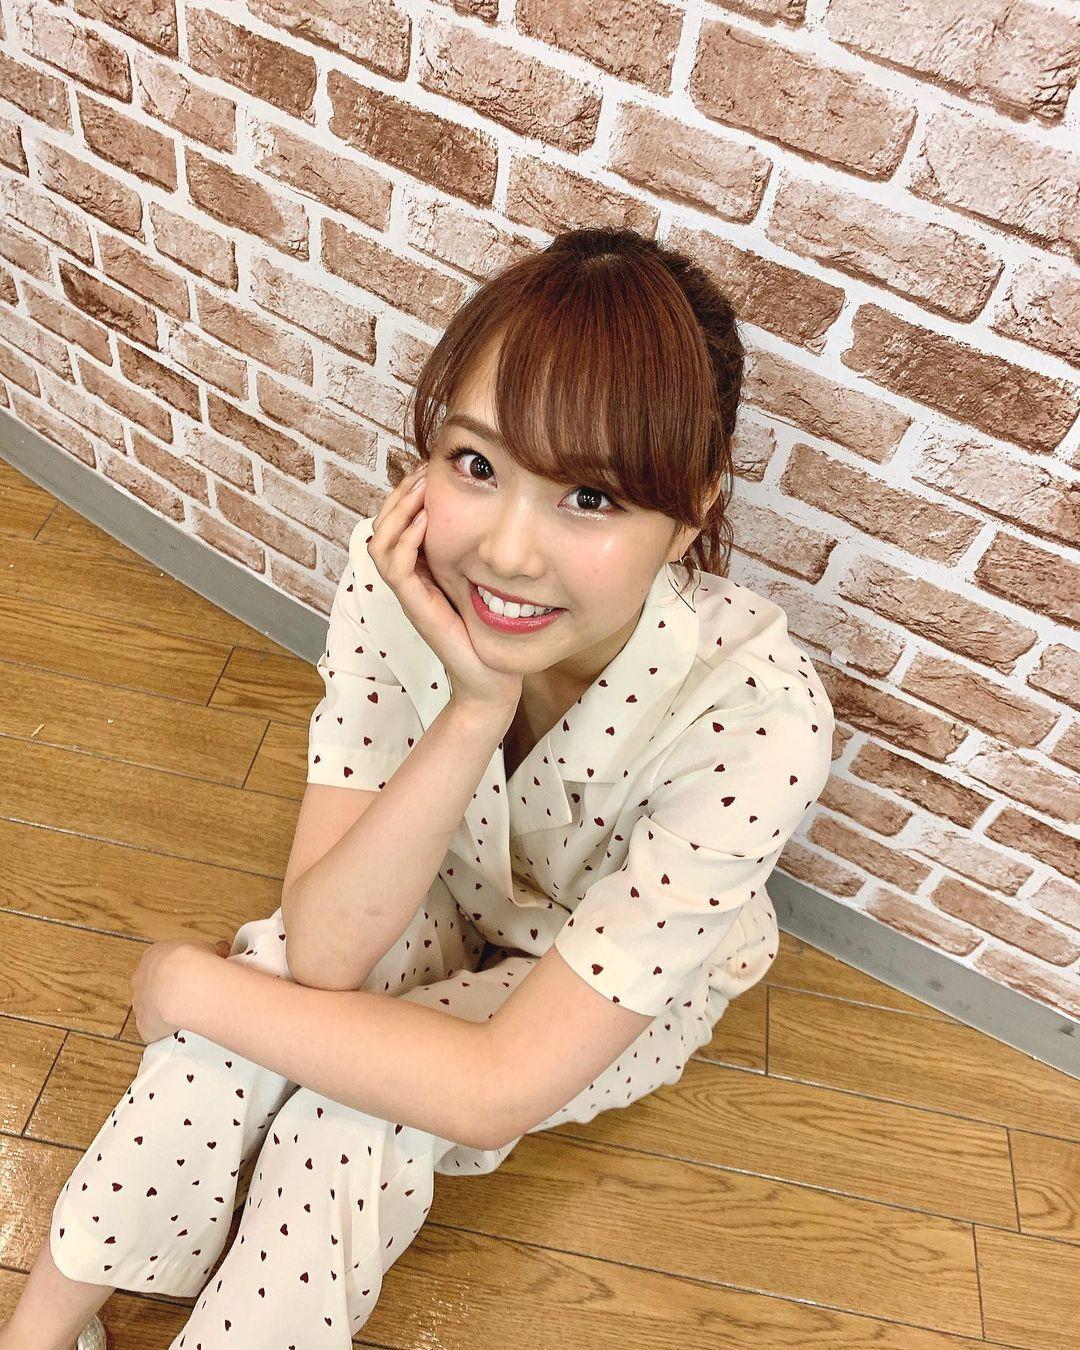 NMB48肉系偶像「加藤夕夏」肉感十足,邻家女孩感好亲近!-新图包